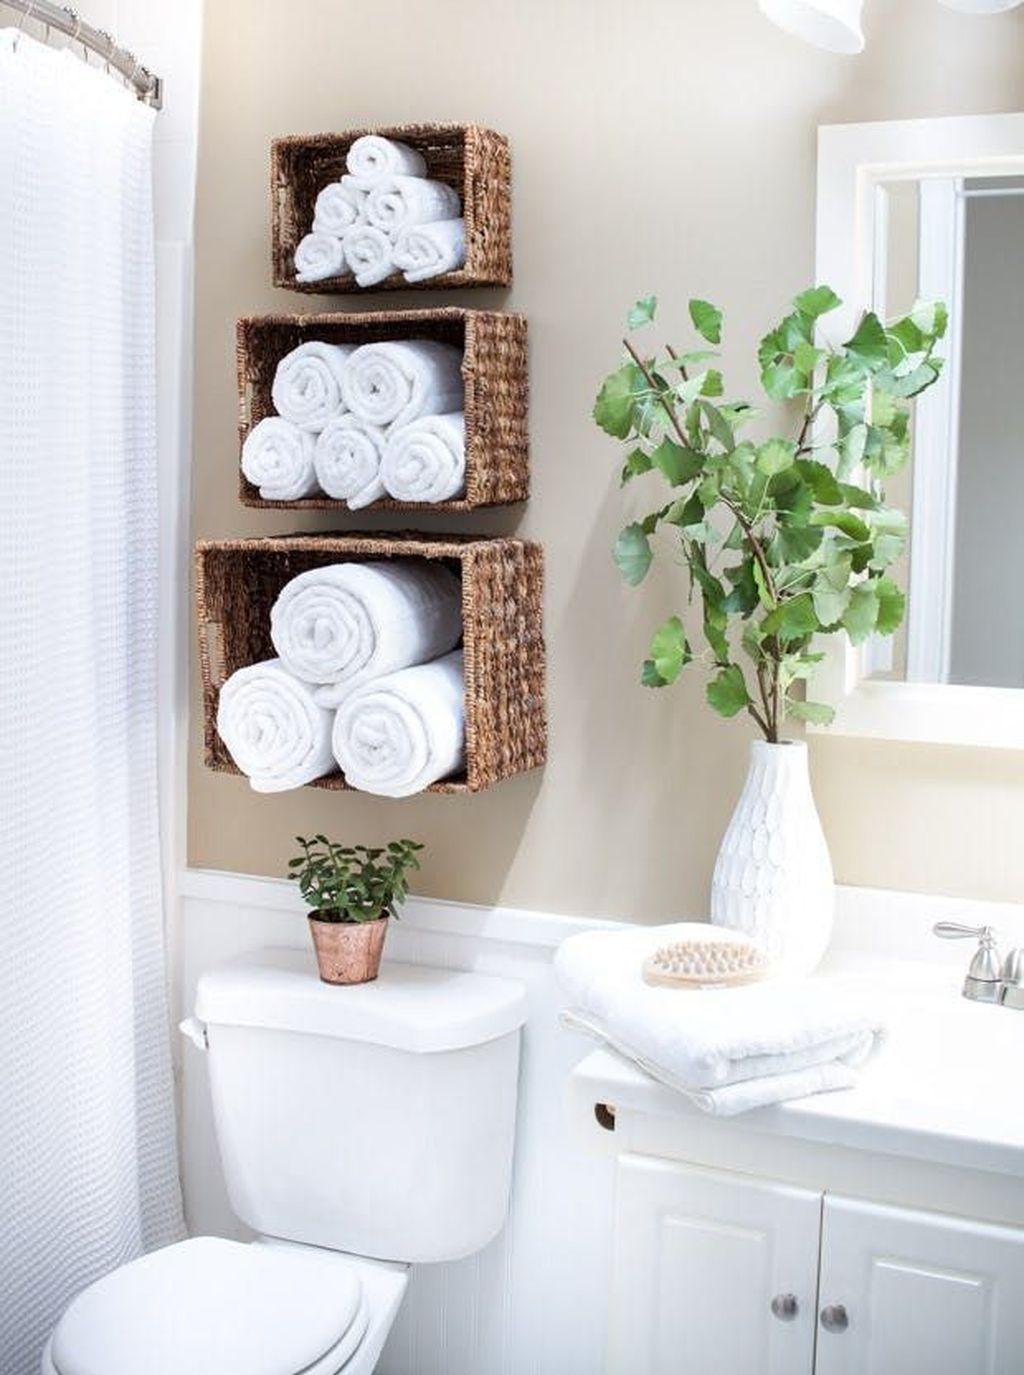 44 Perfect Spring Bathroom Decorating Ideas Trendehouse Diy Bathroom Storage Small Bathroom Decor Small Appartment